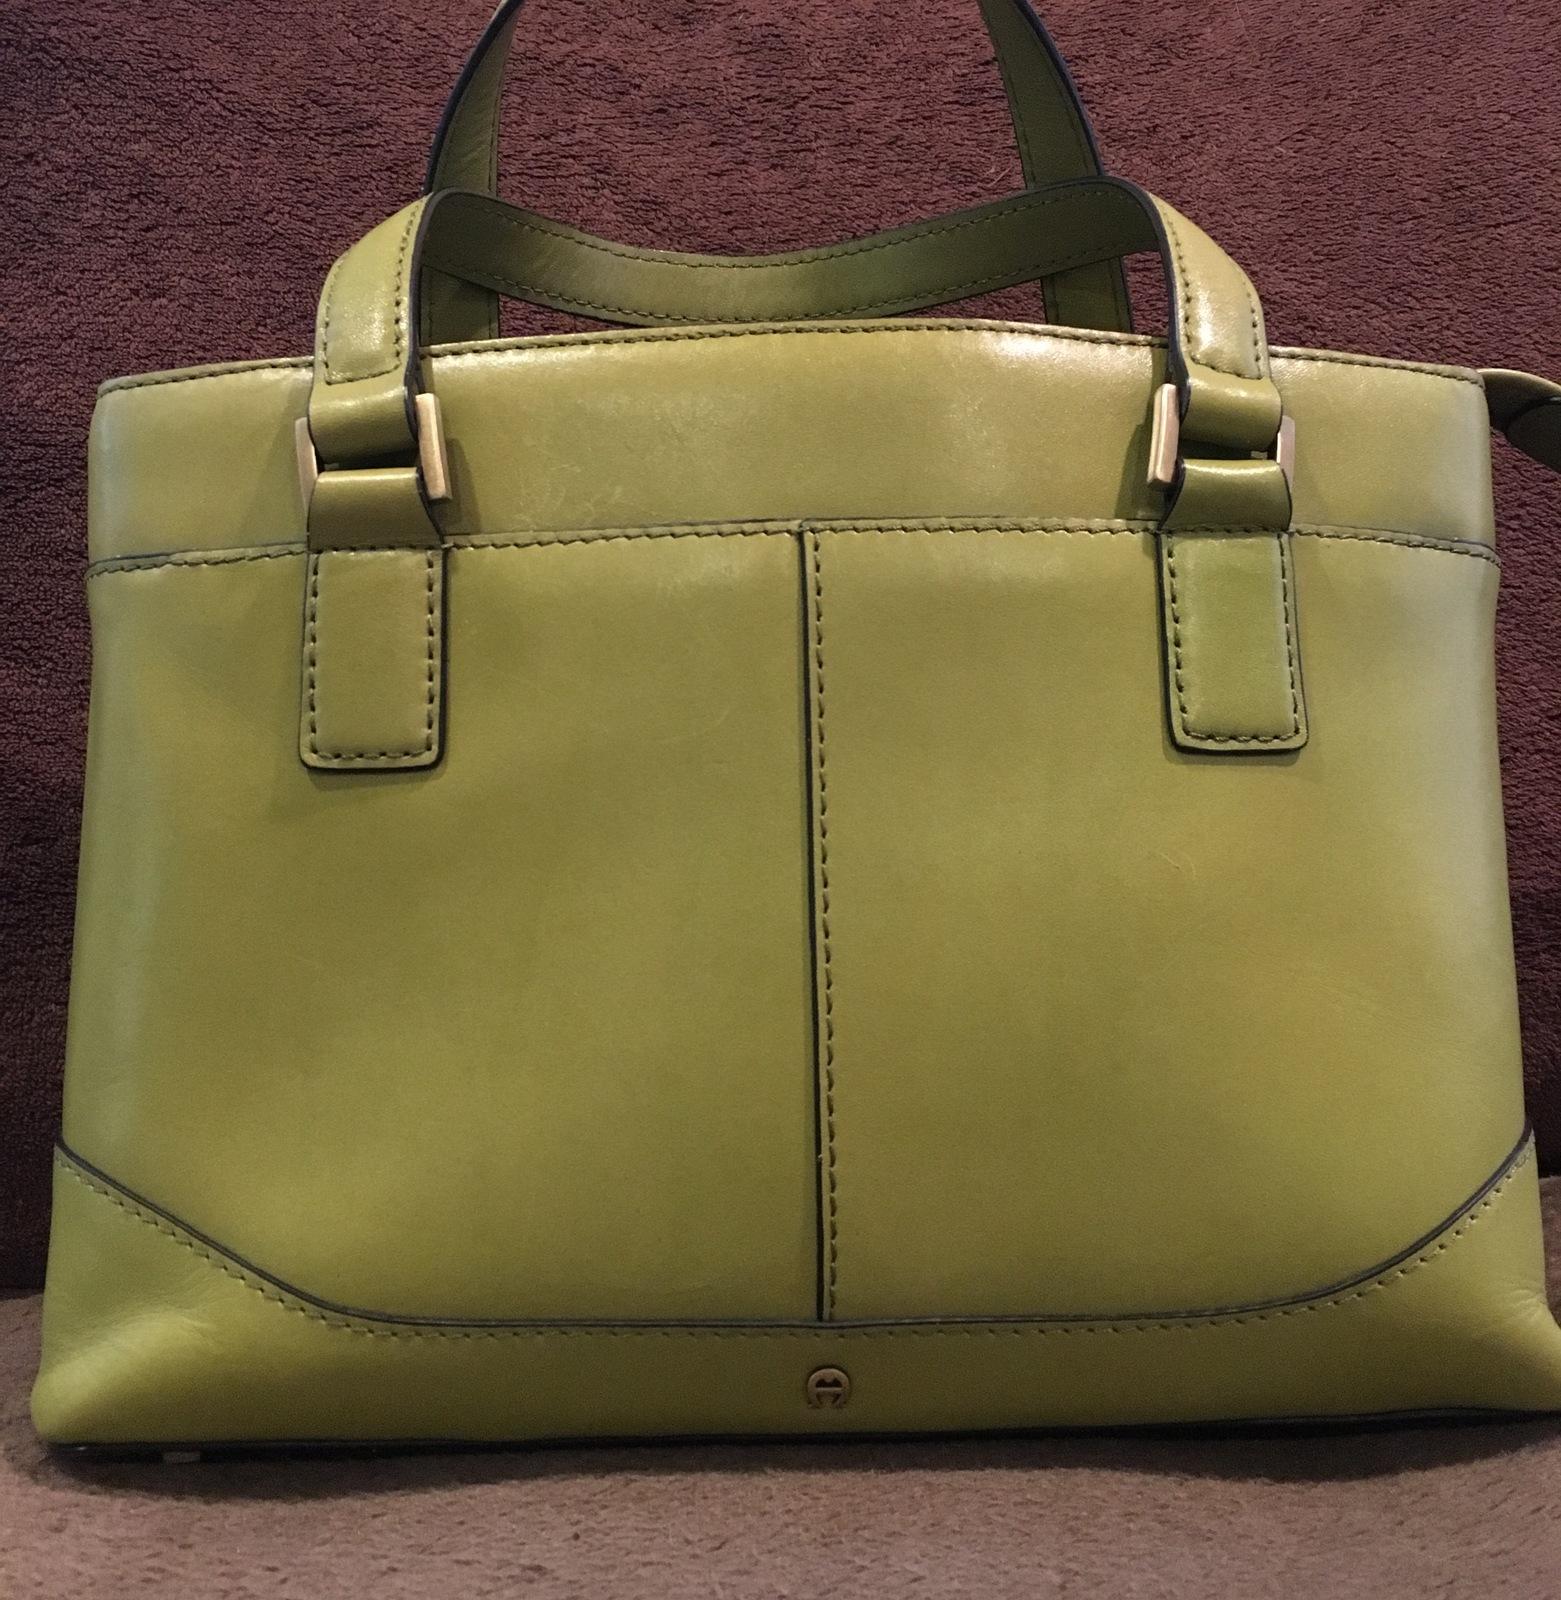 Etienne Aigner Leather Handbag Vintage and 40 similar items. Image 773638d610db6